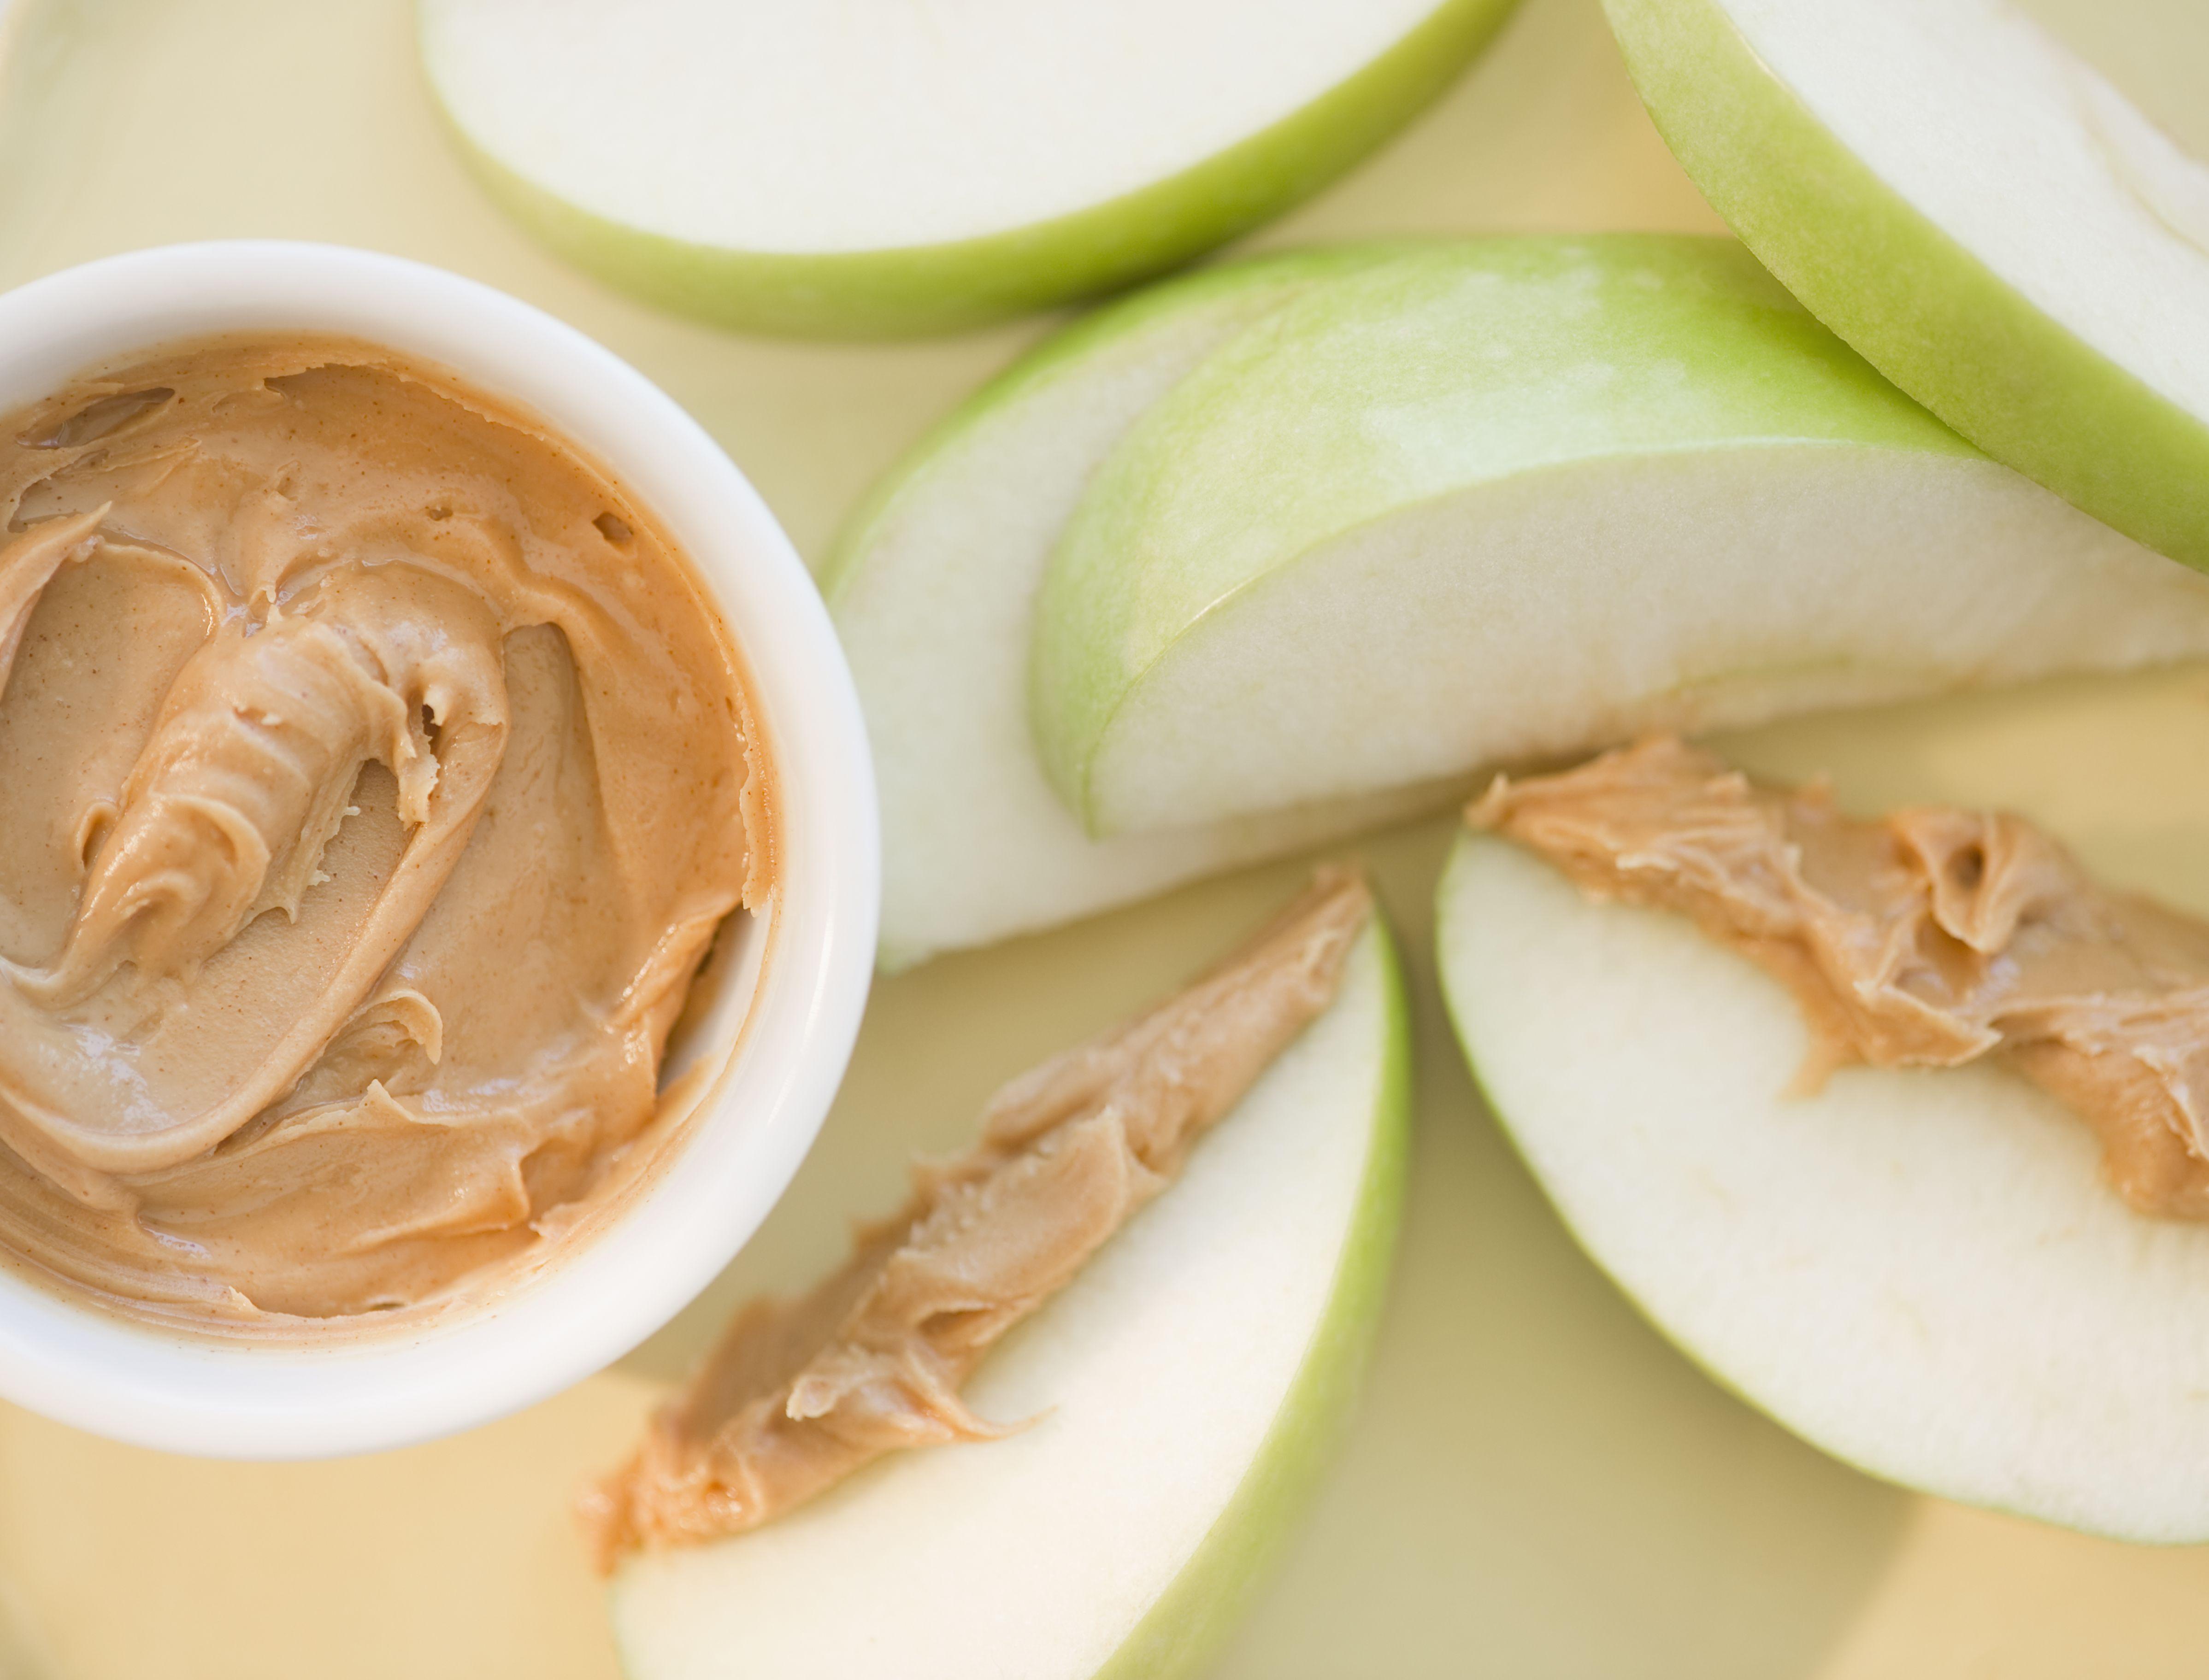 peanut butter before bed burn fat